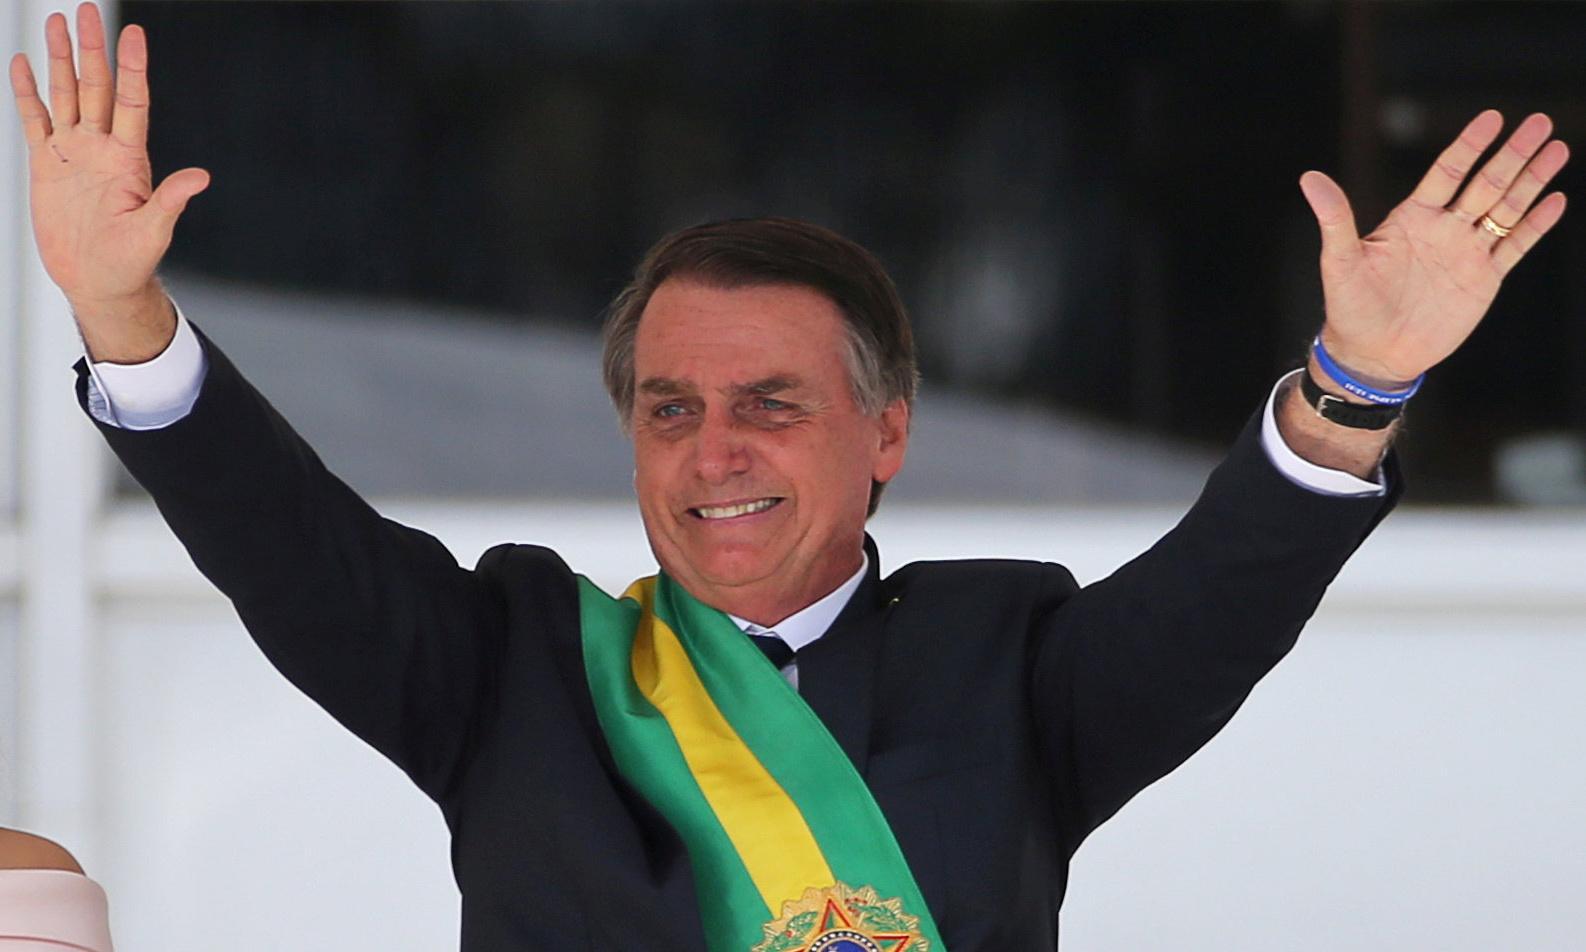 He's been president a week – and already Bolsonaro is damaging Brazil